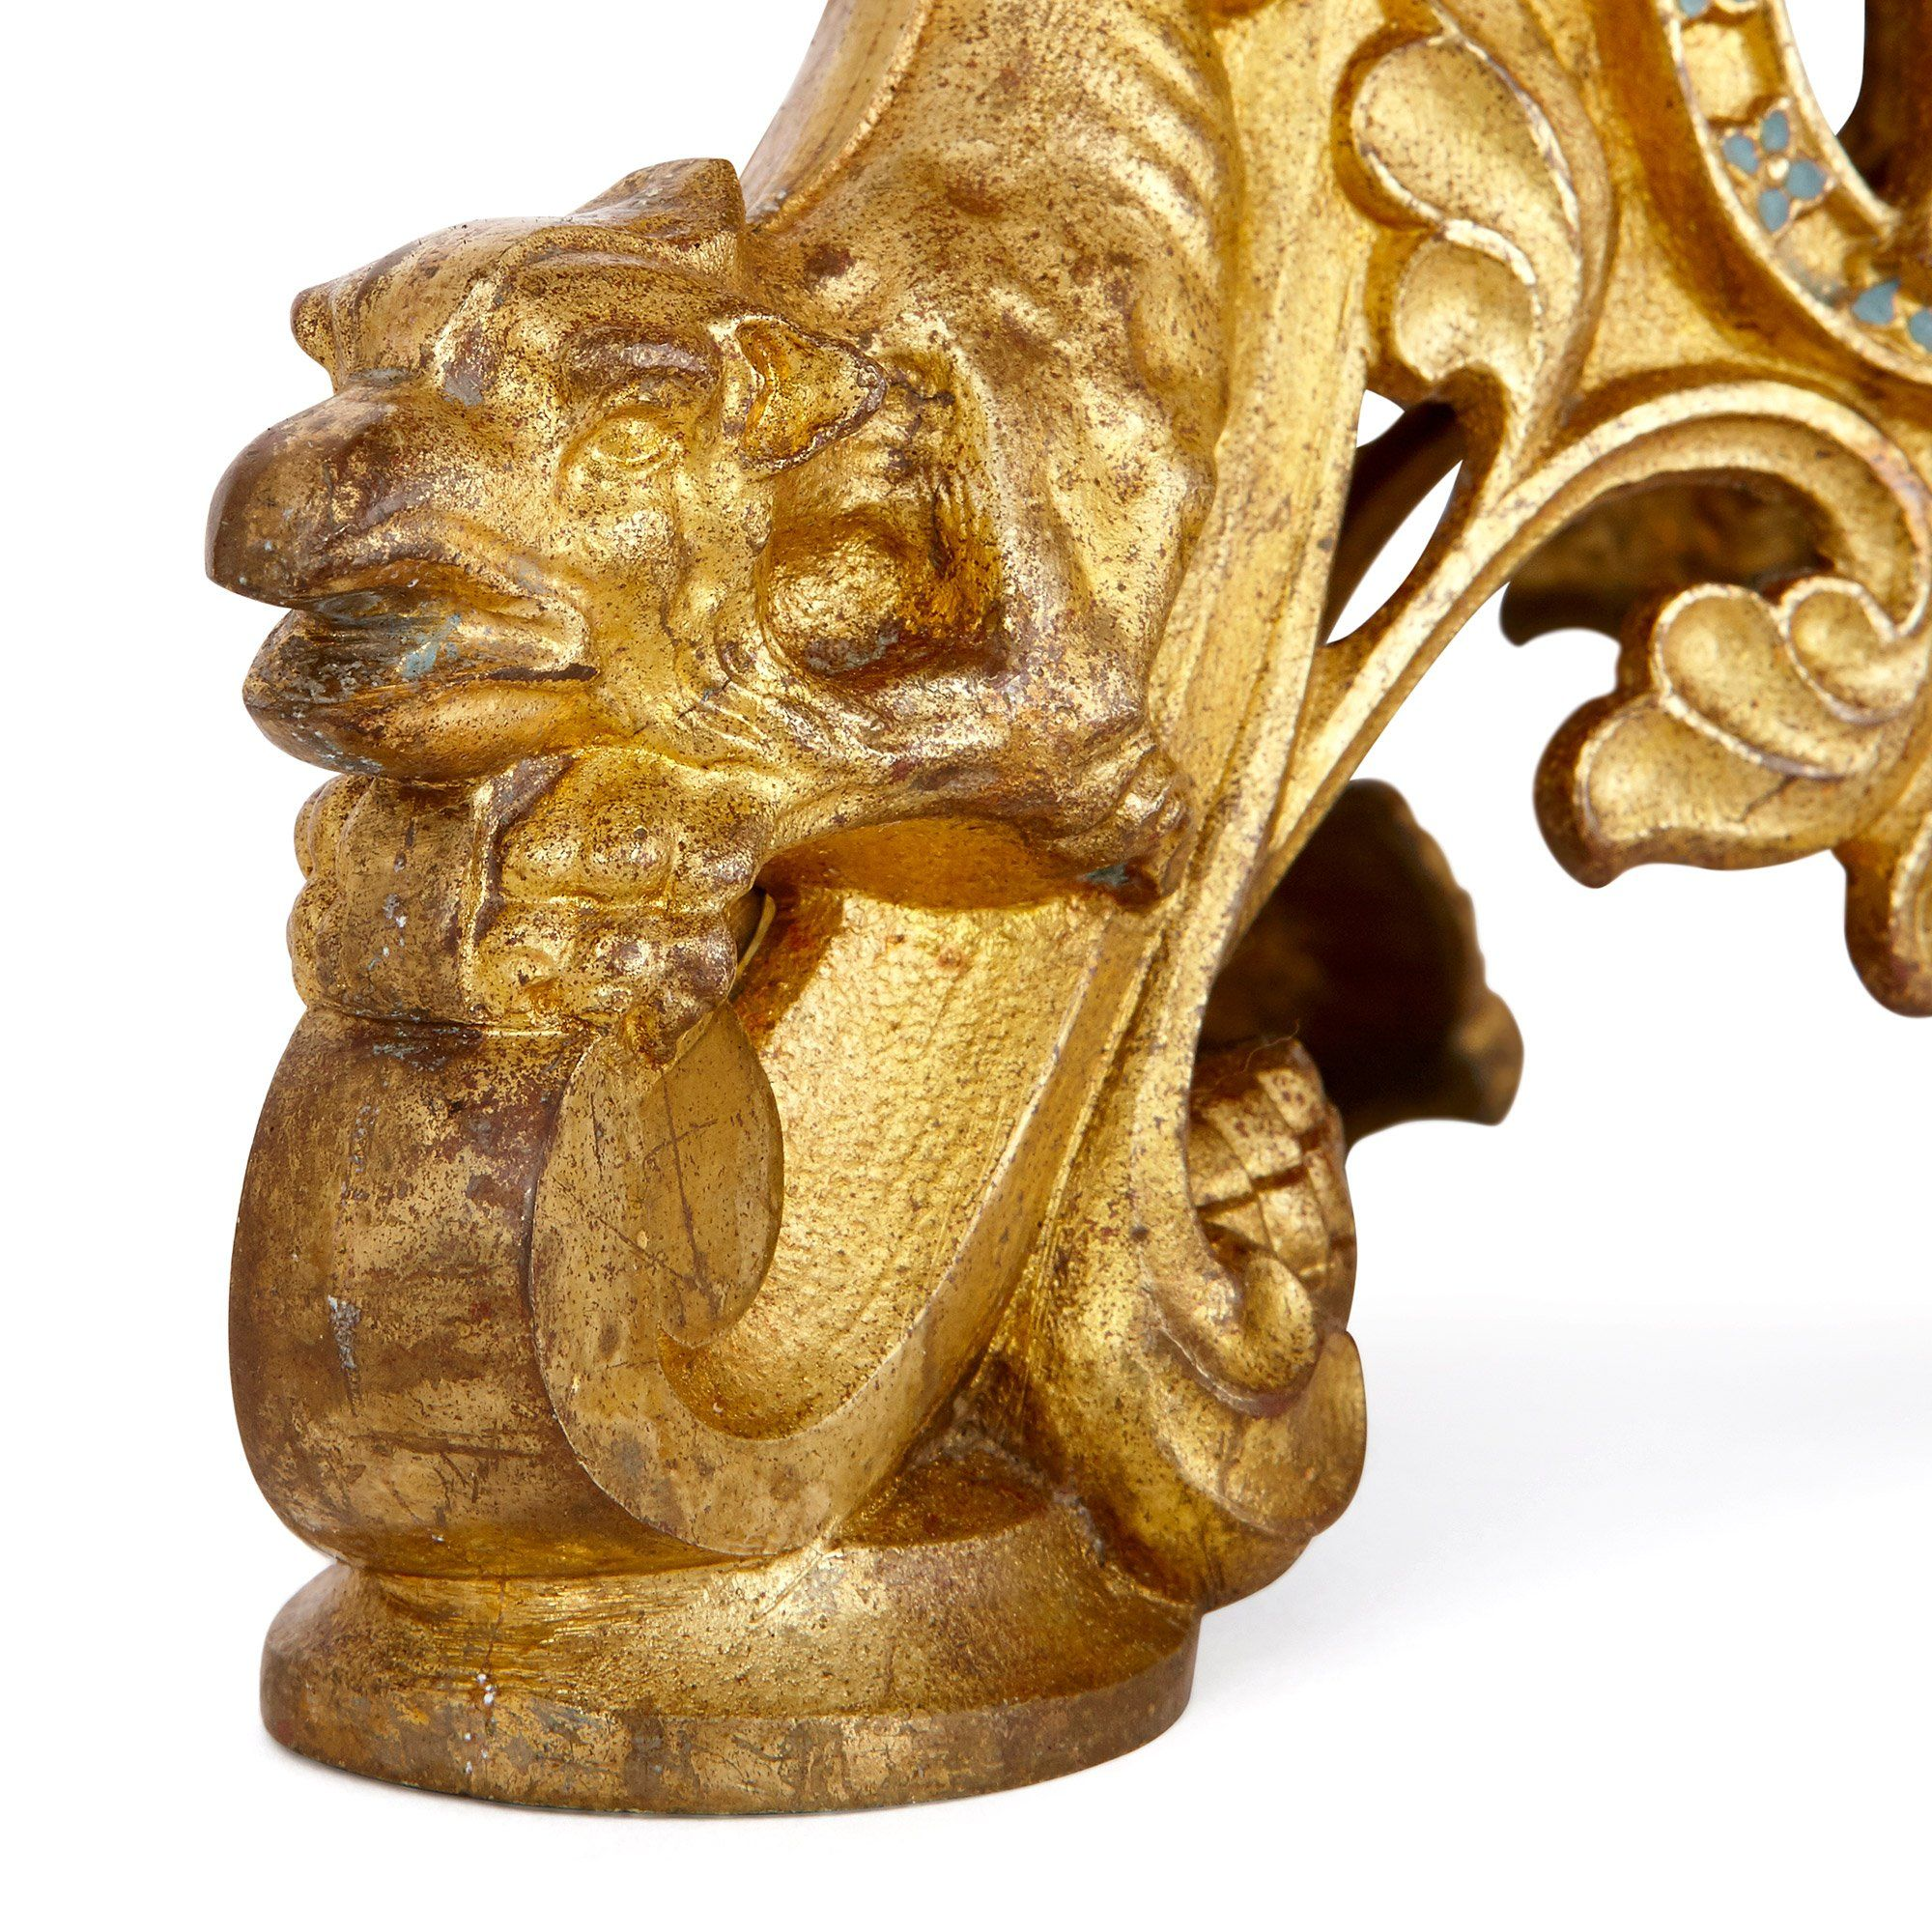 Pair Of Baroque Style Ormolu And Enamel Altar Candelabra